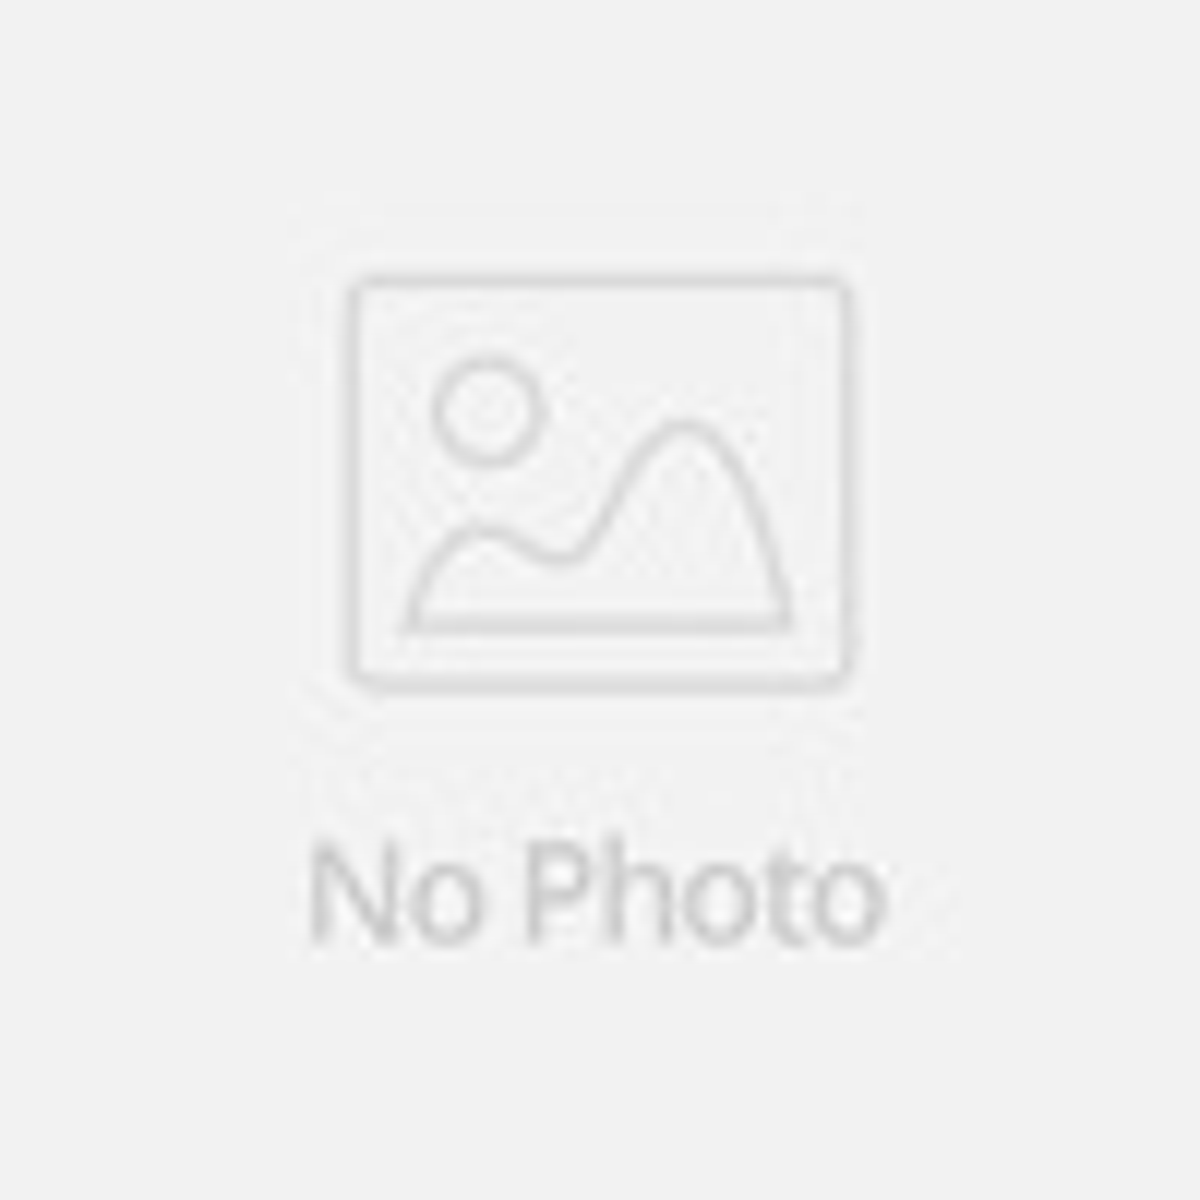 Mini Short Leather Business Credit ID Card Holder Wallet Storage Pocket Case(China (Mainland))